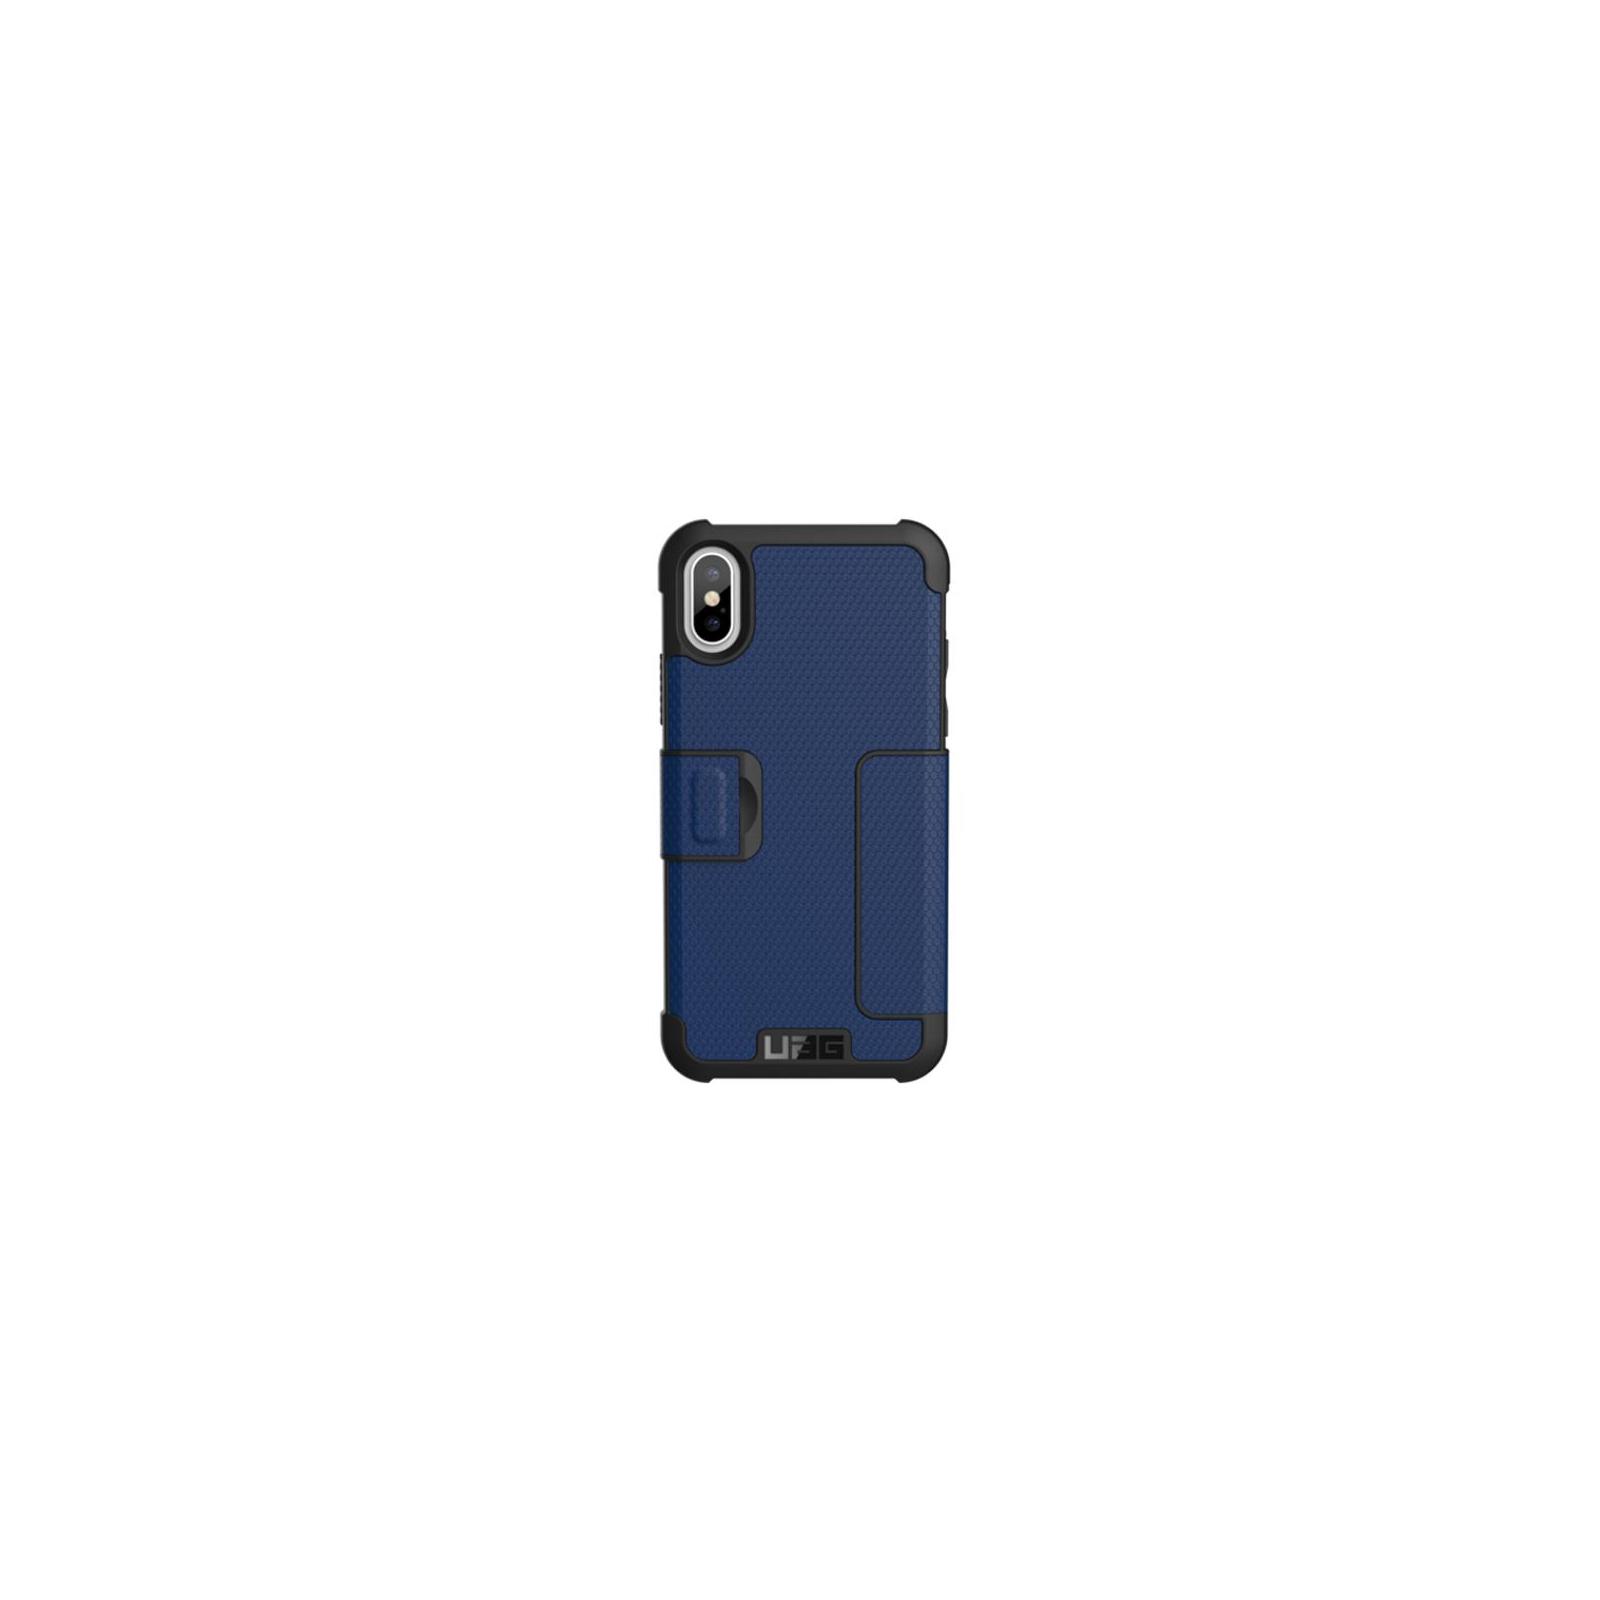 Чехол для моб. телефона Uag iPhone X Metropolis Black (IPH8-E-BL)